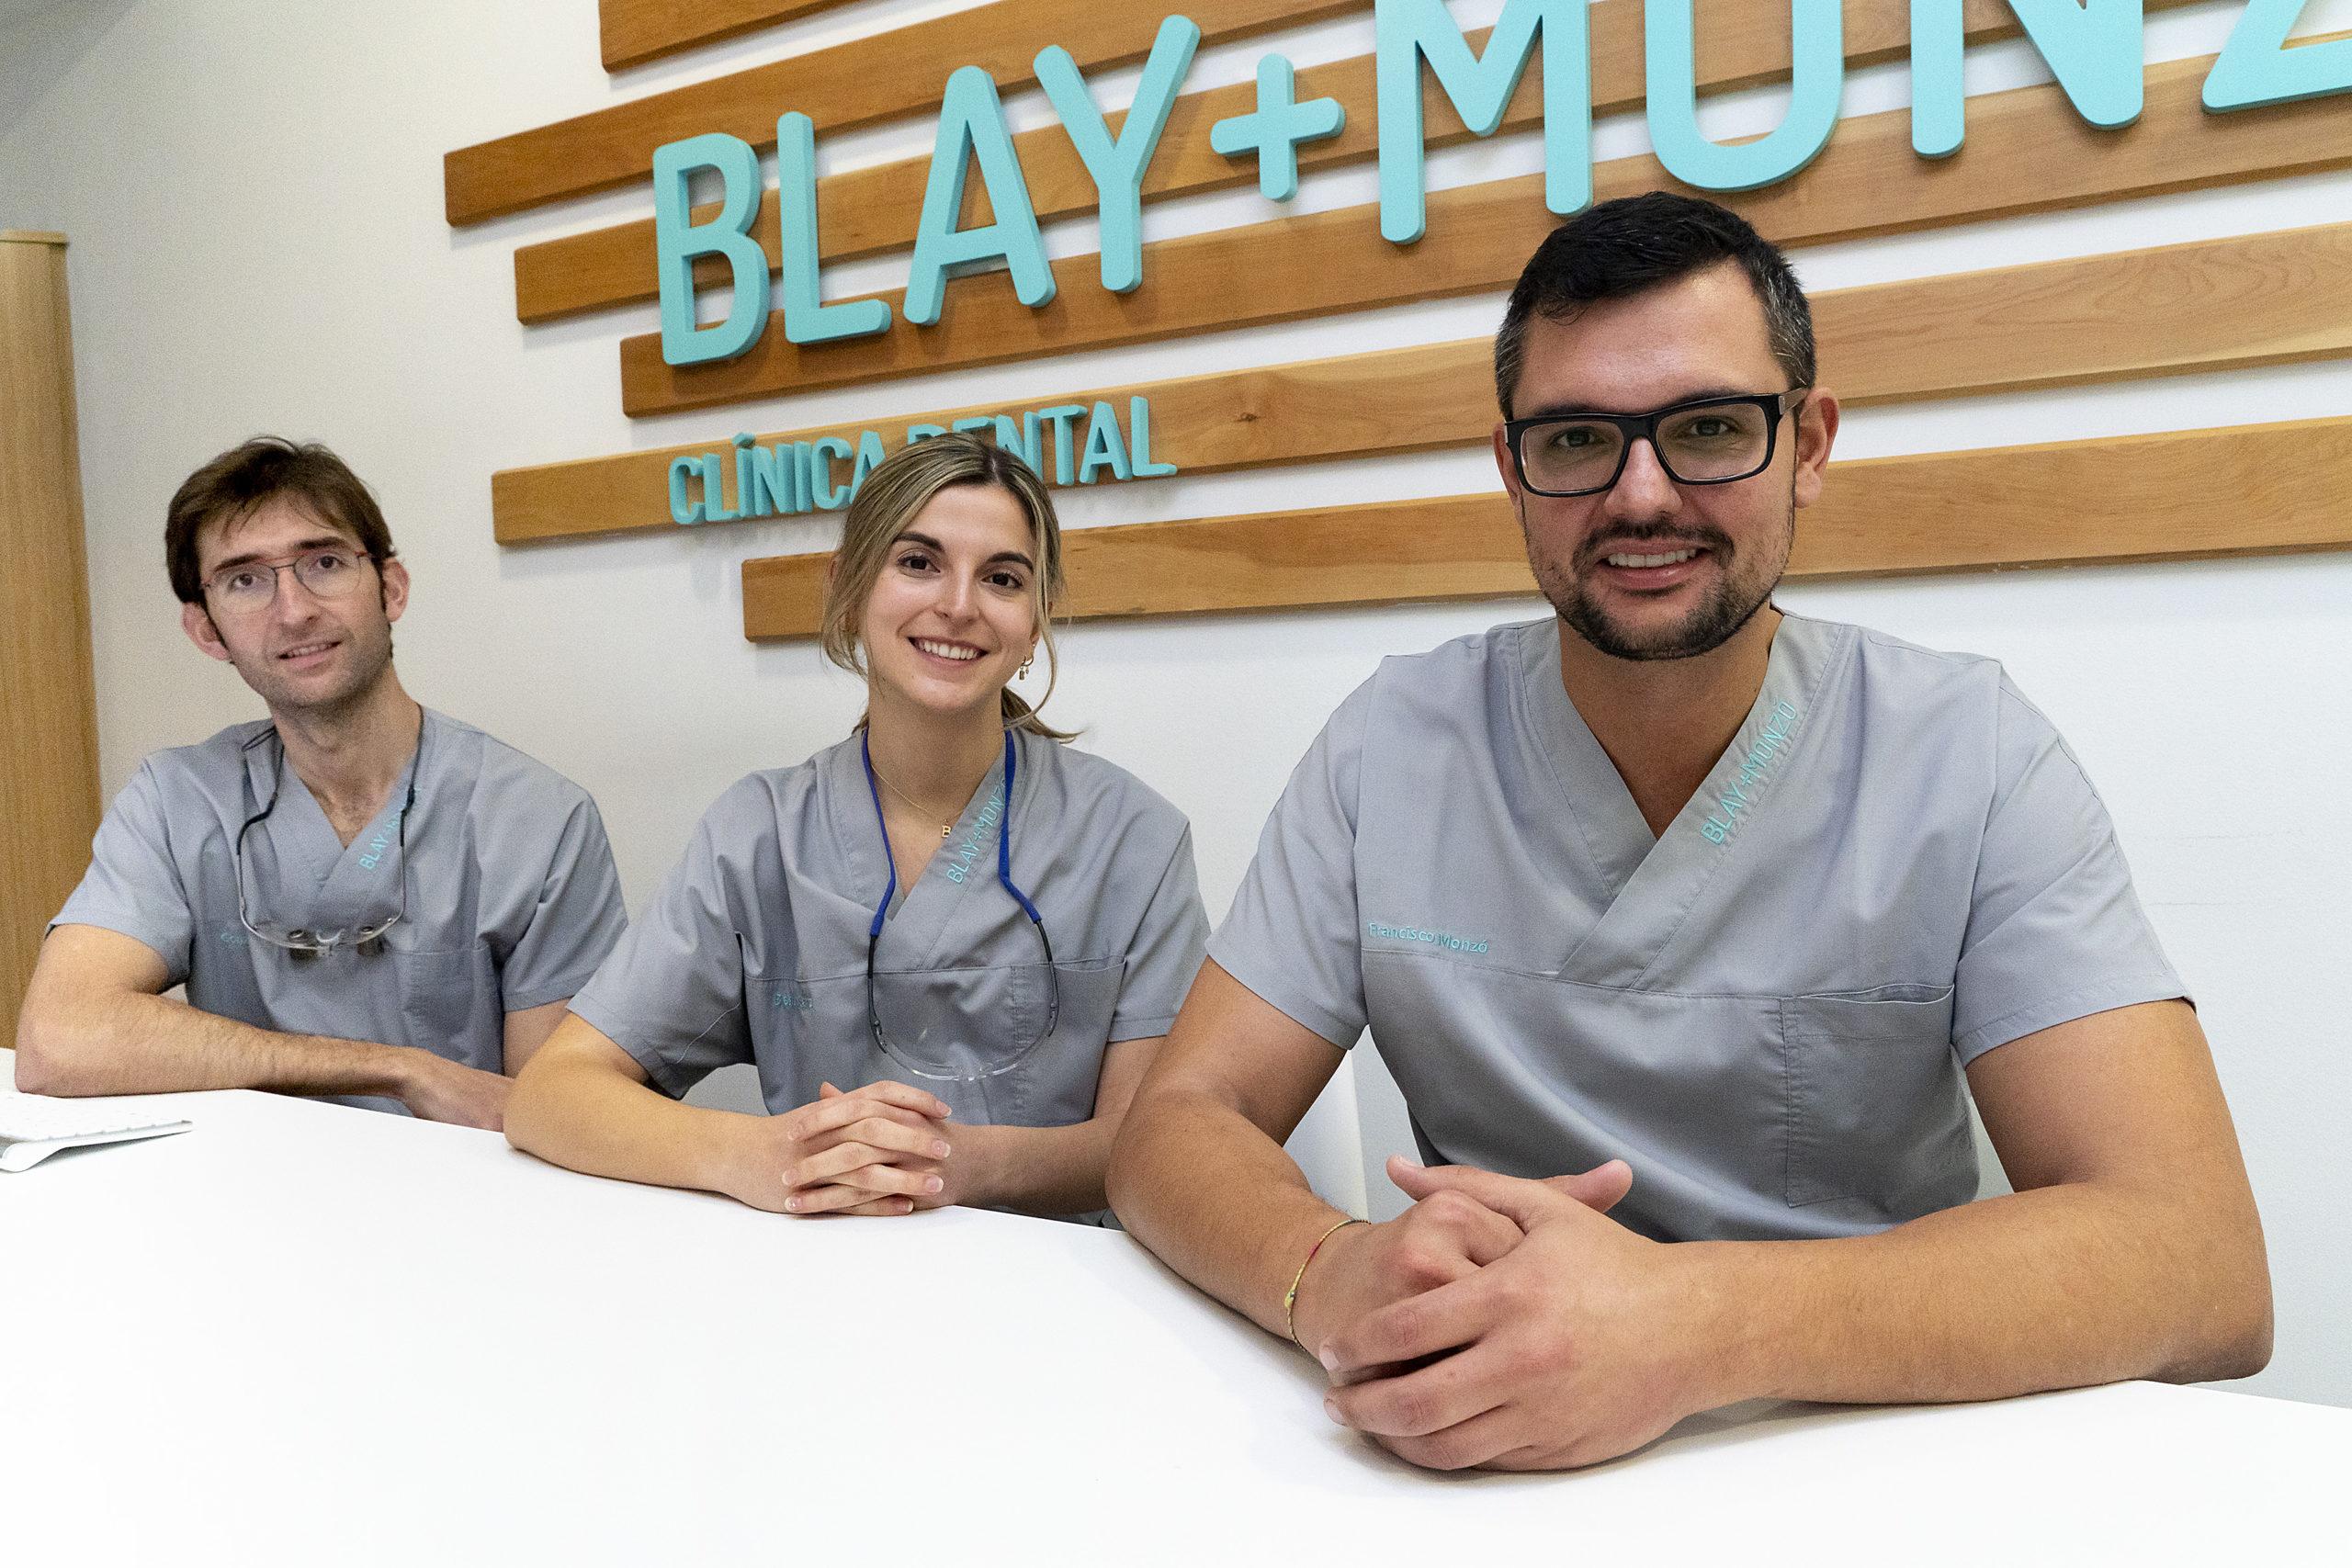 Foto de equipo en clínica Blay+Monzó